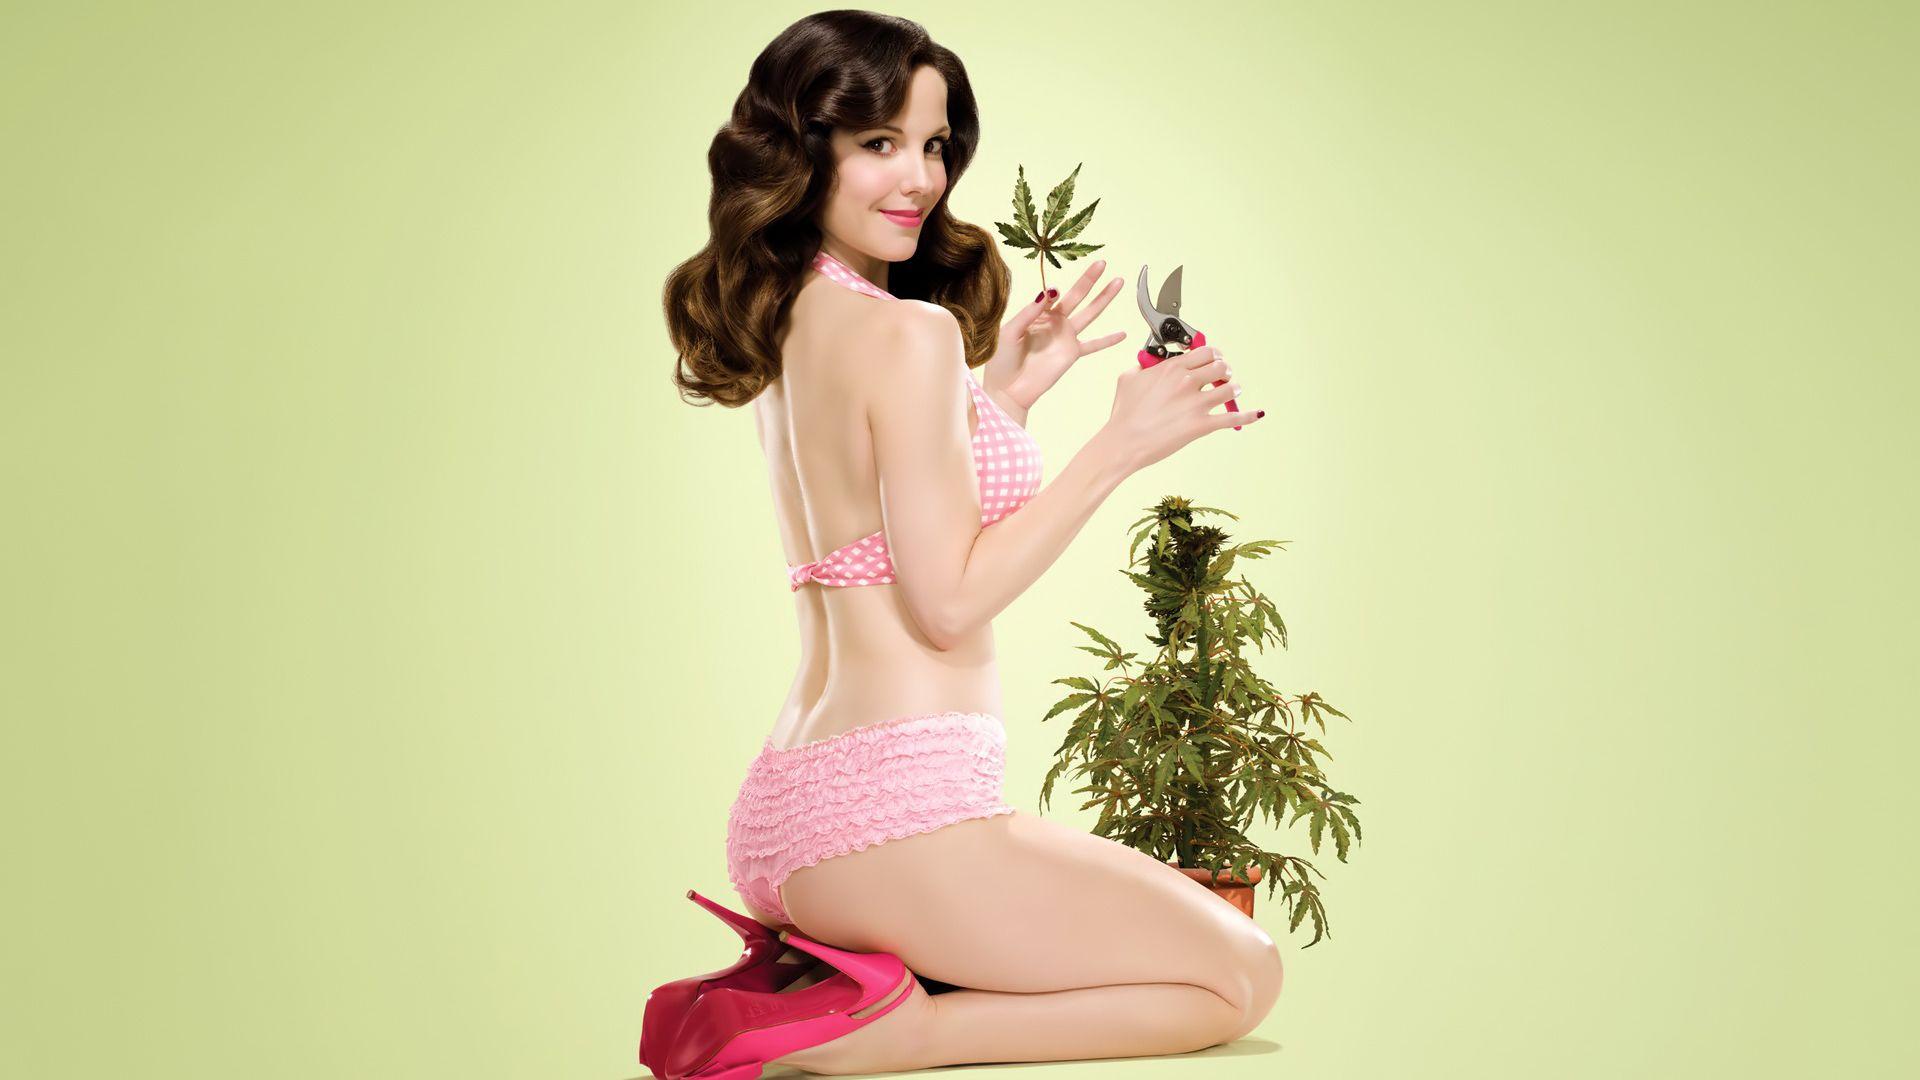 10 Countries Where Cannabis Could Soon Be Legal